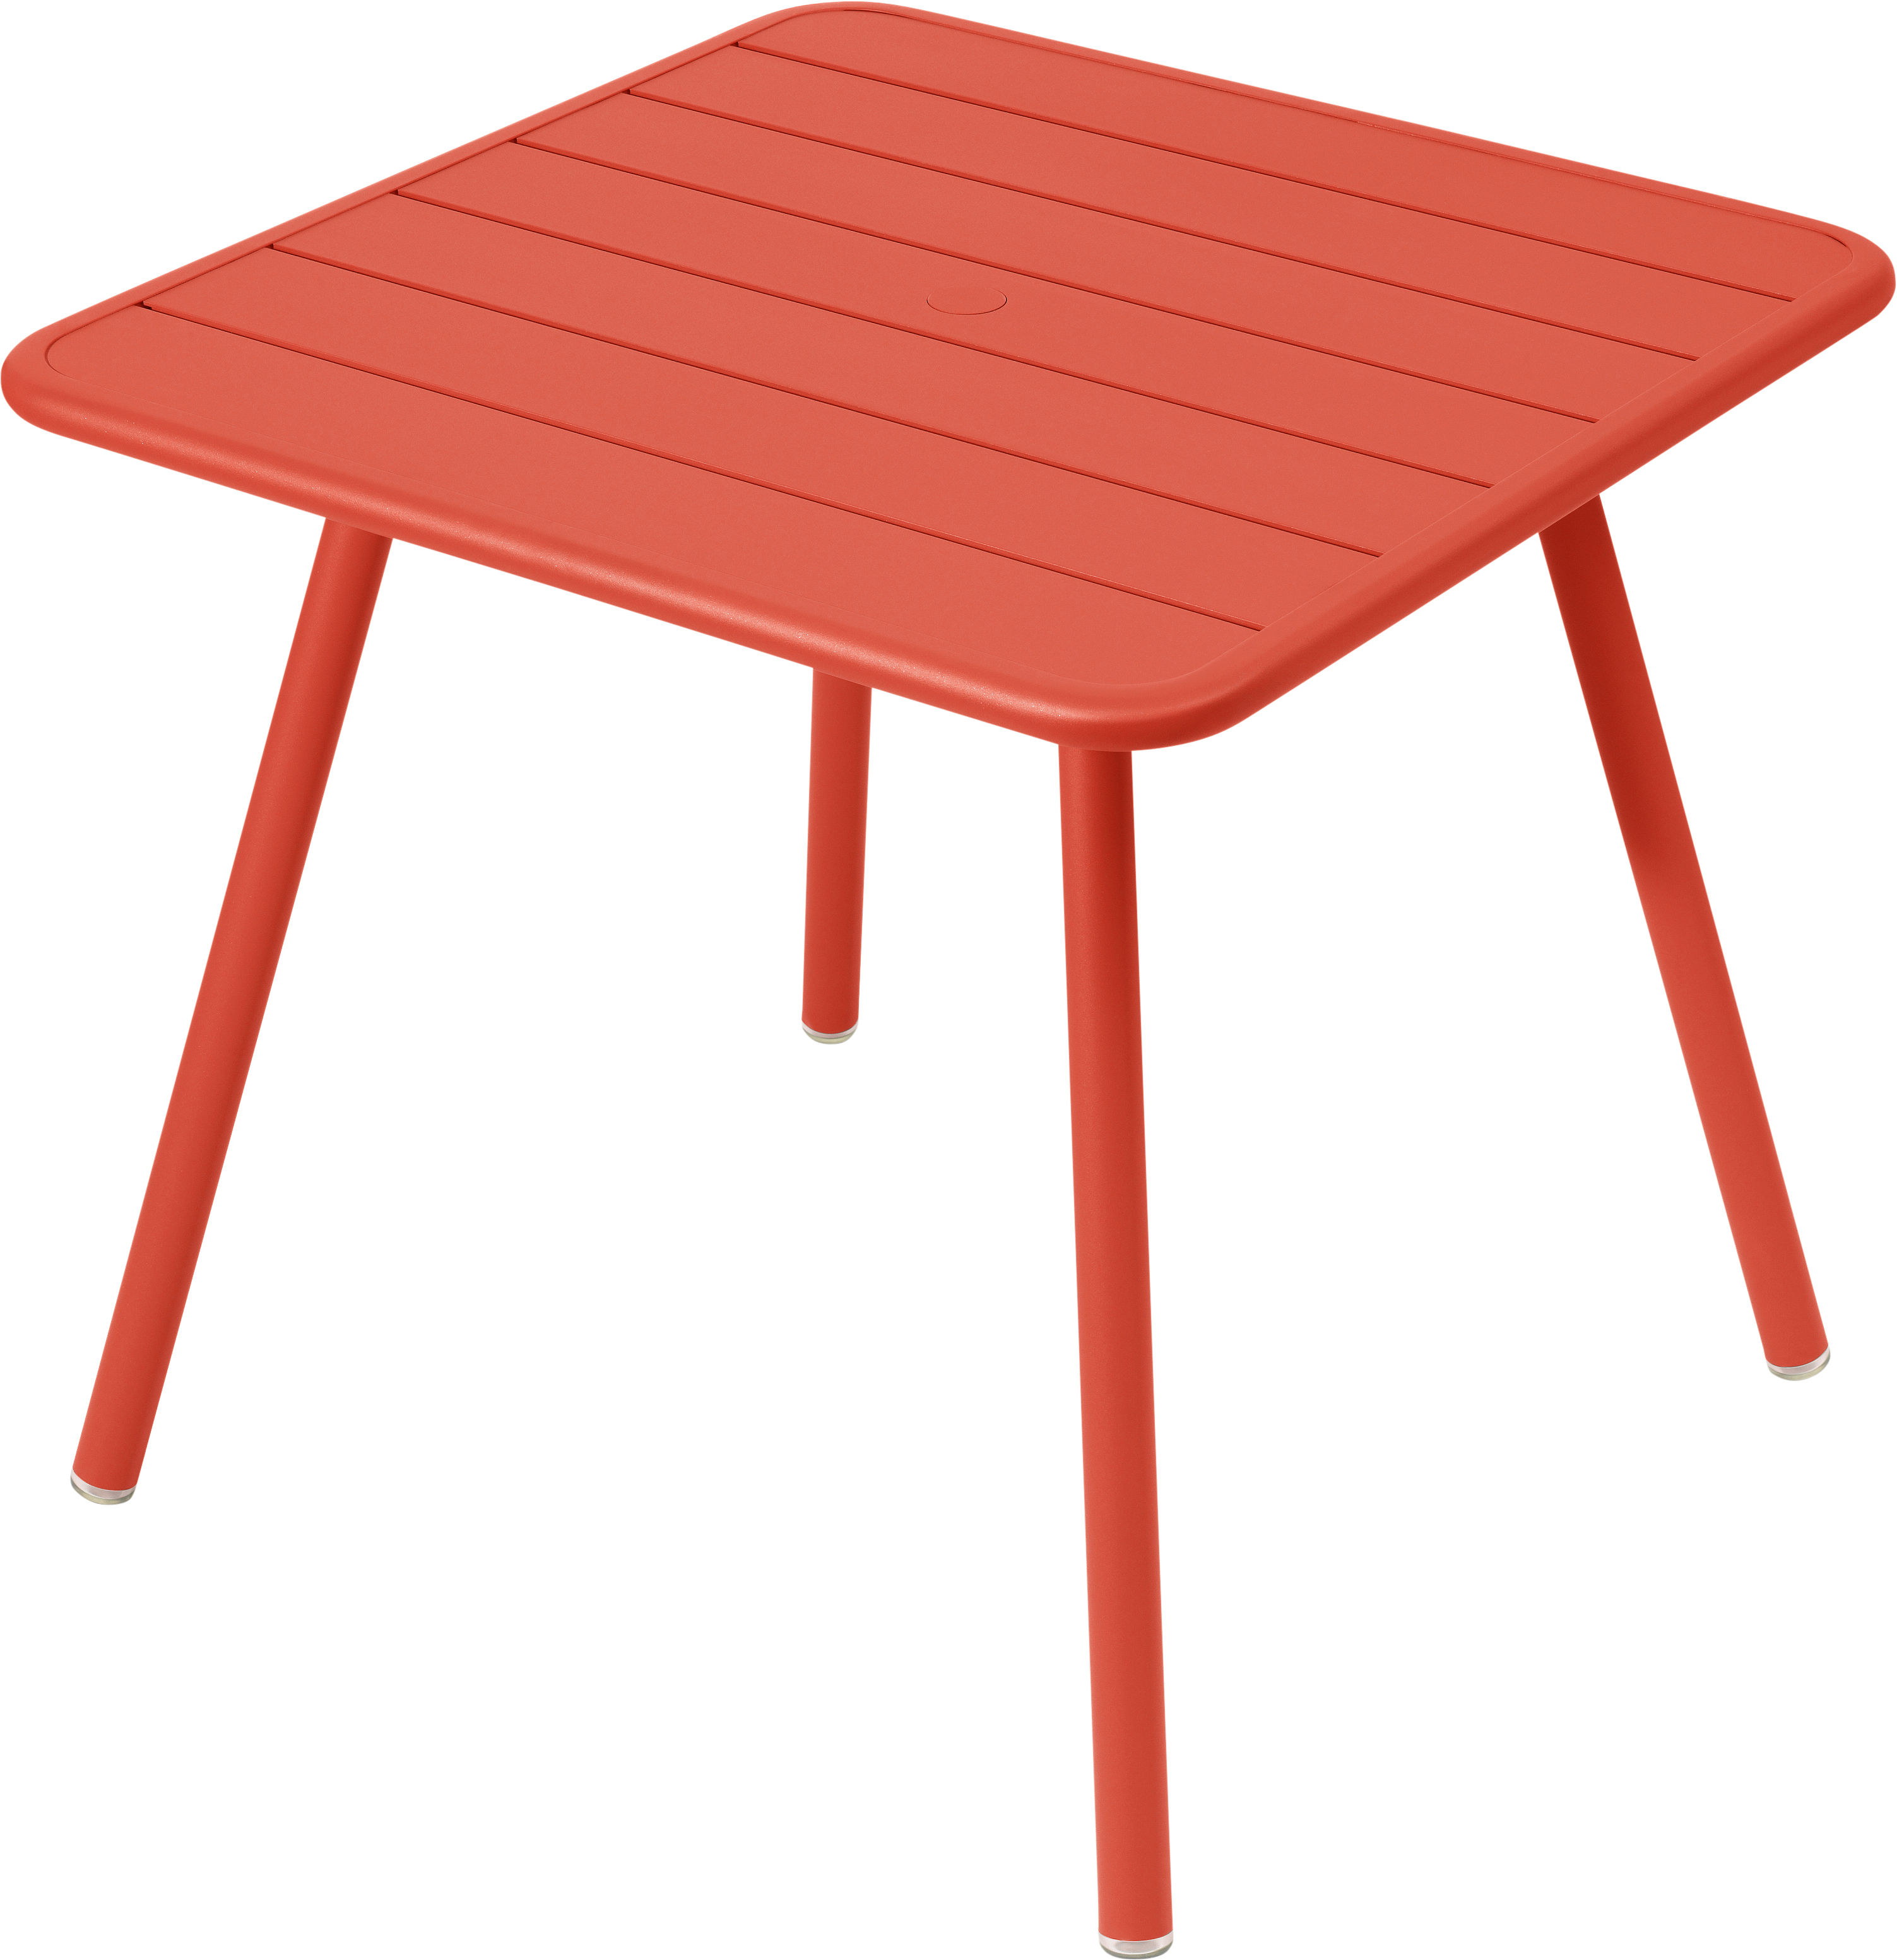 Outdoor - Tables de jardin - Table carrée Luxembourg / 80 x 80 cm - 4 pieds - Fermob - Capucine - Aluminium laqué